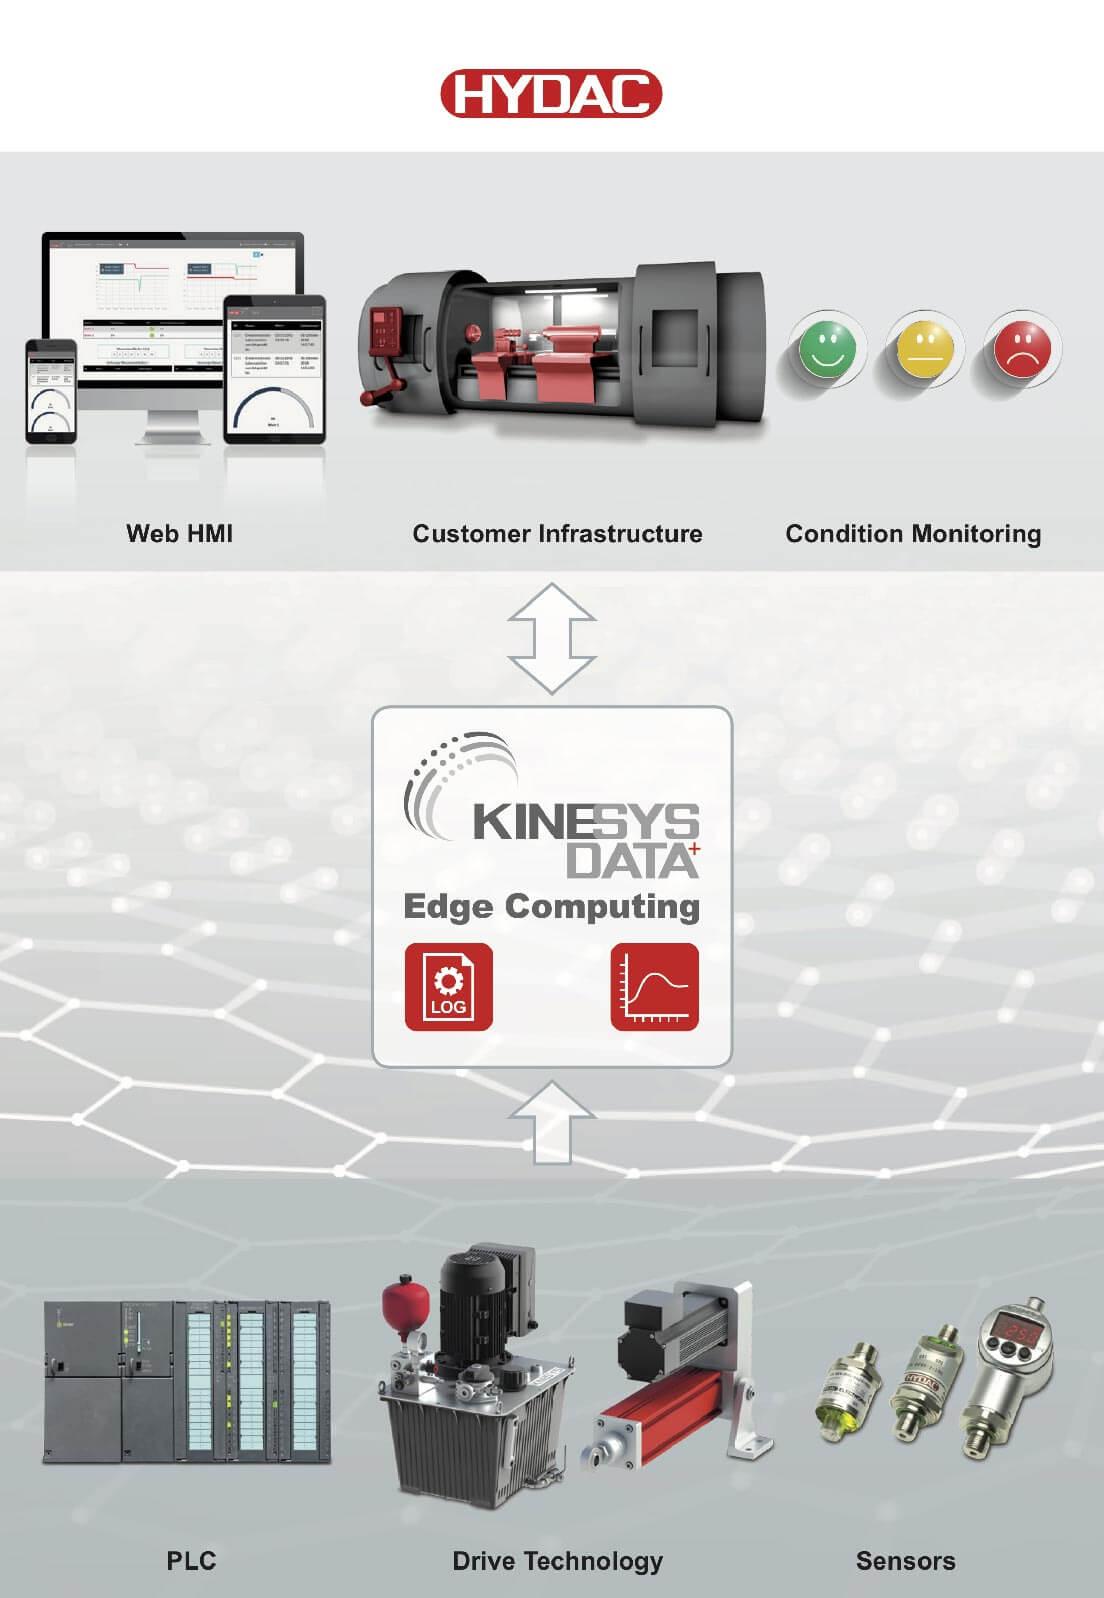 KineSys